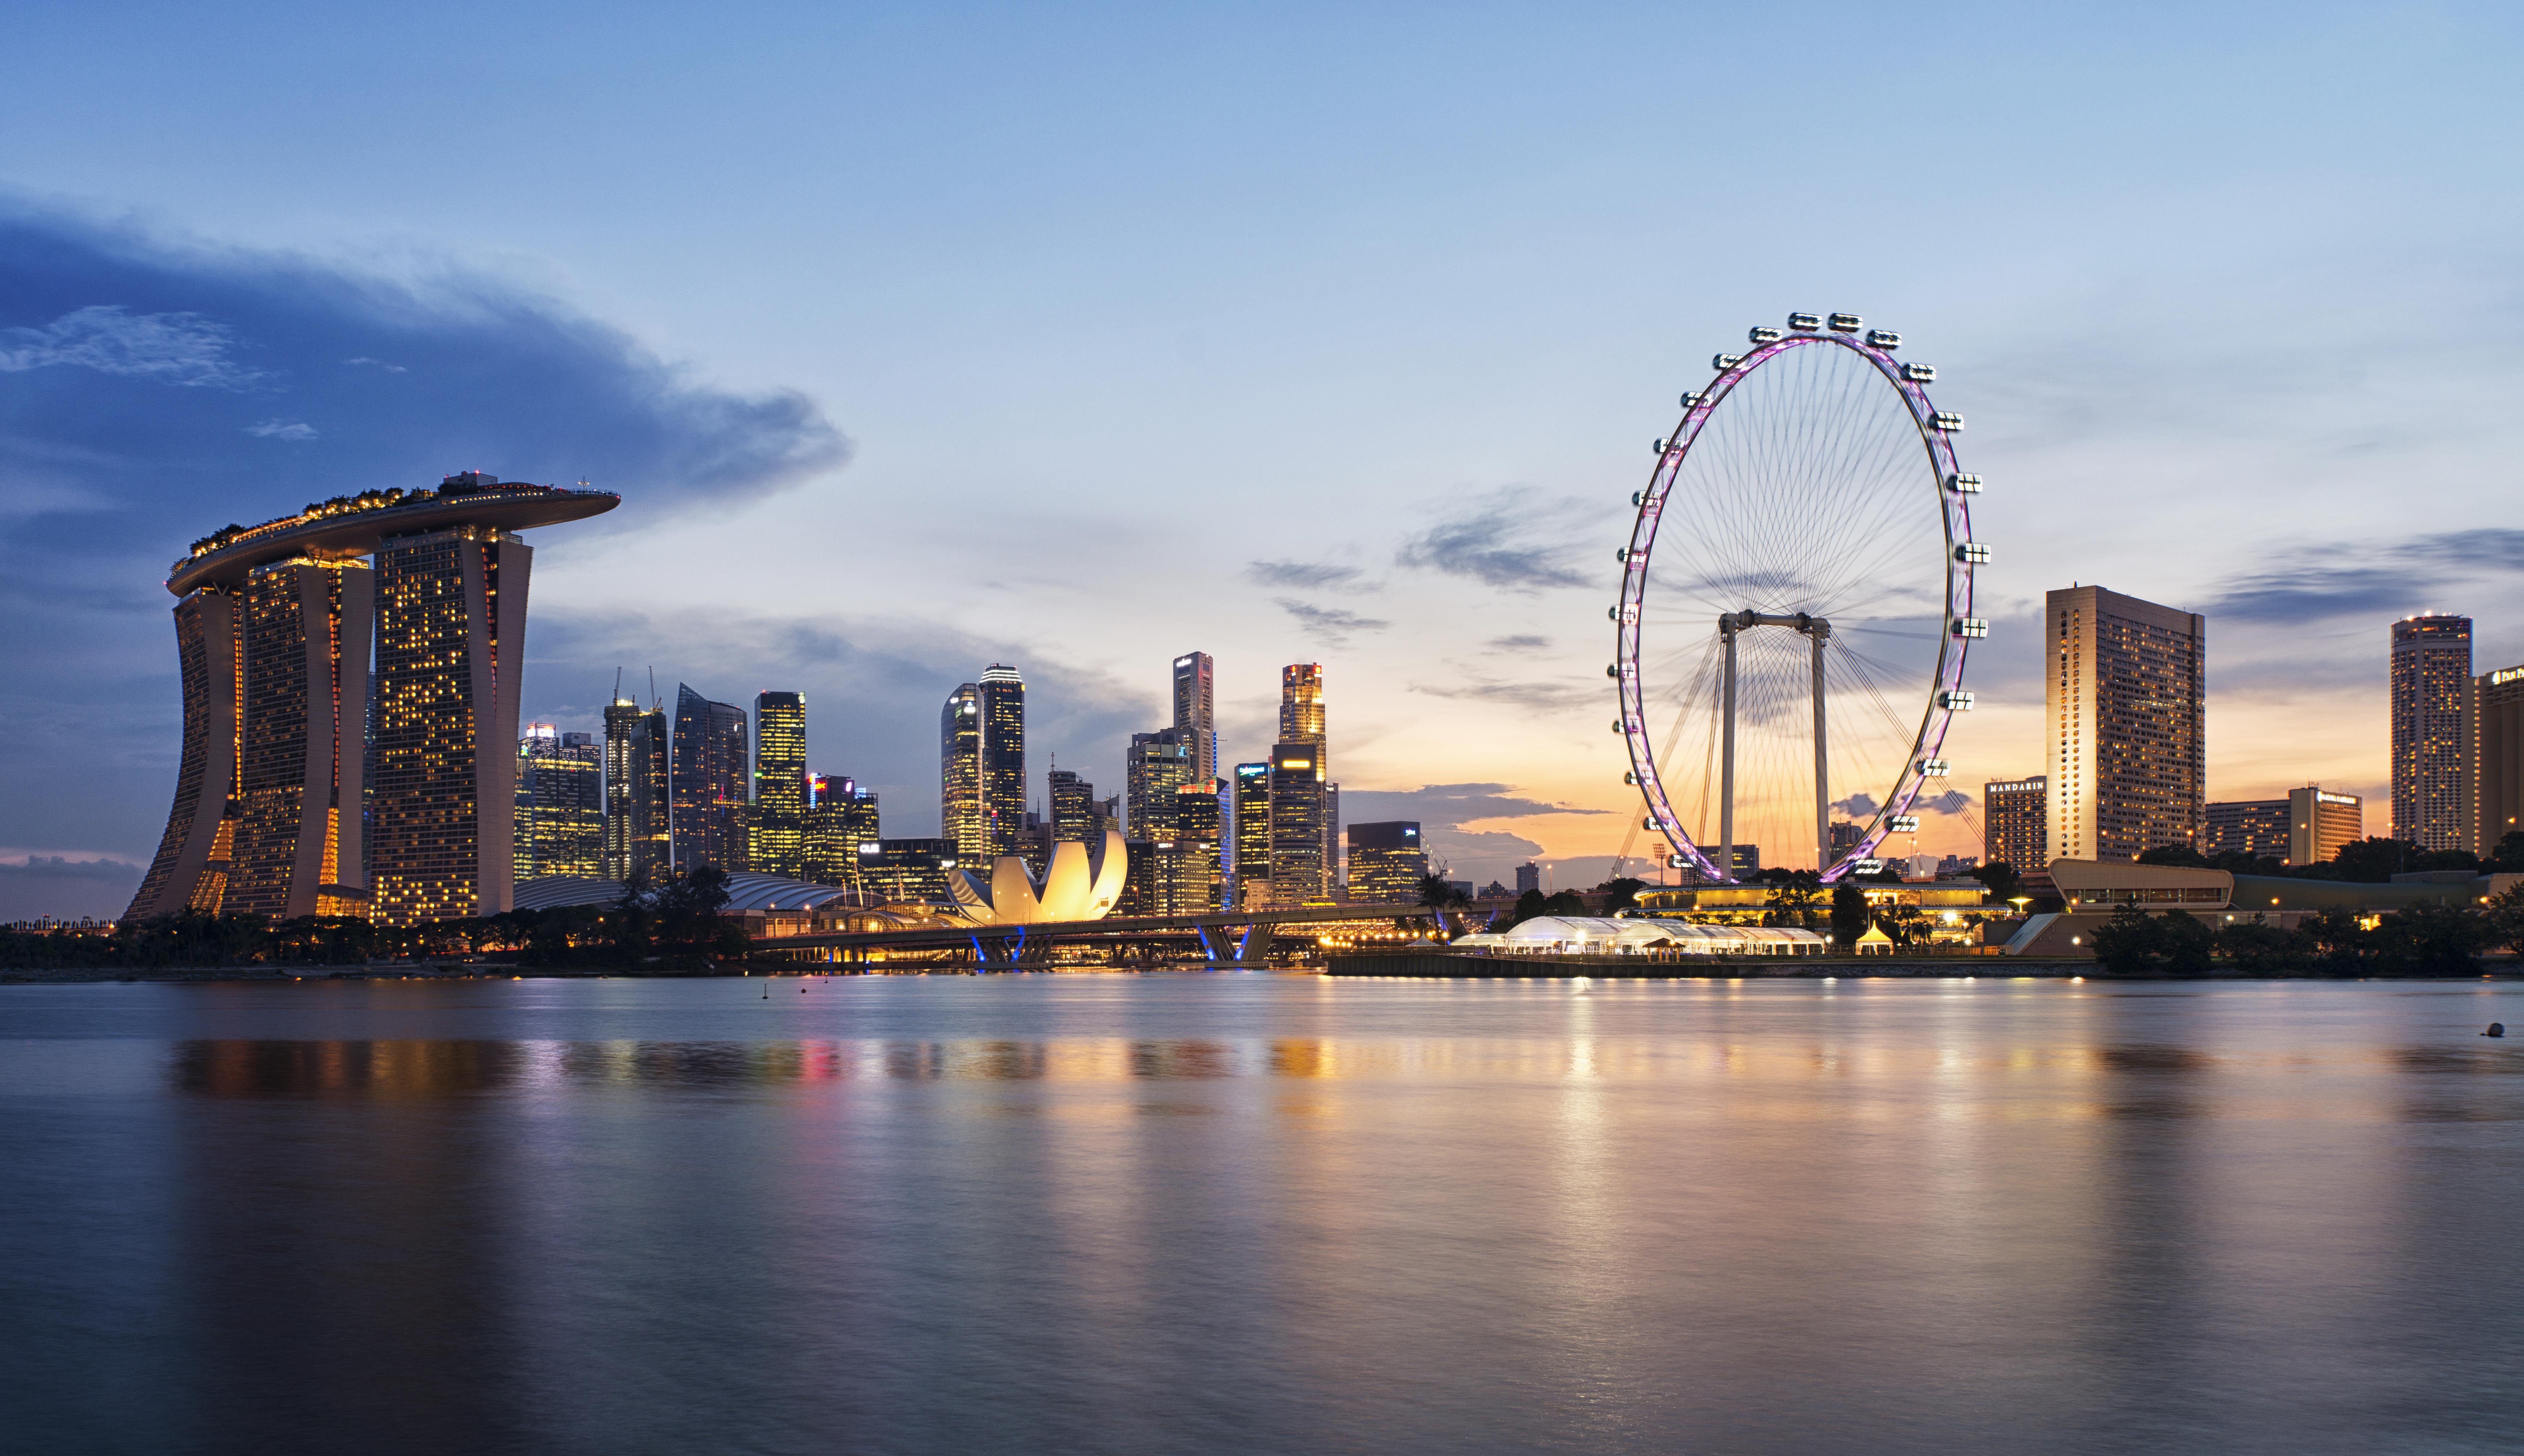 Singapura lidera a lista / Wikimedia commons